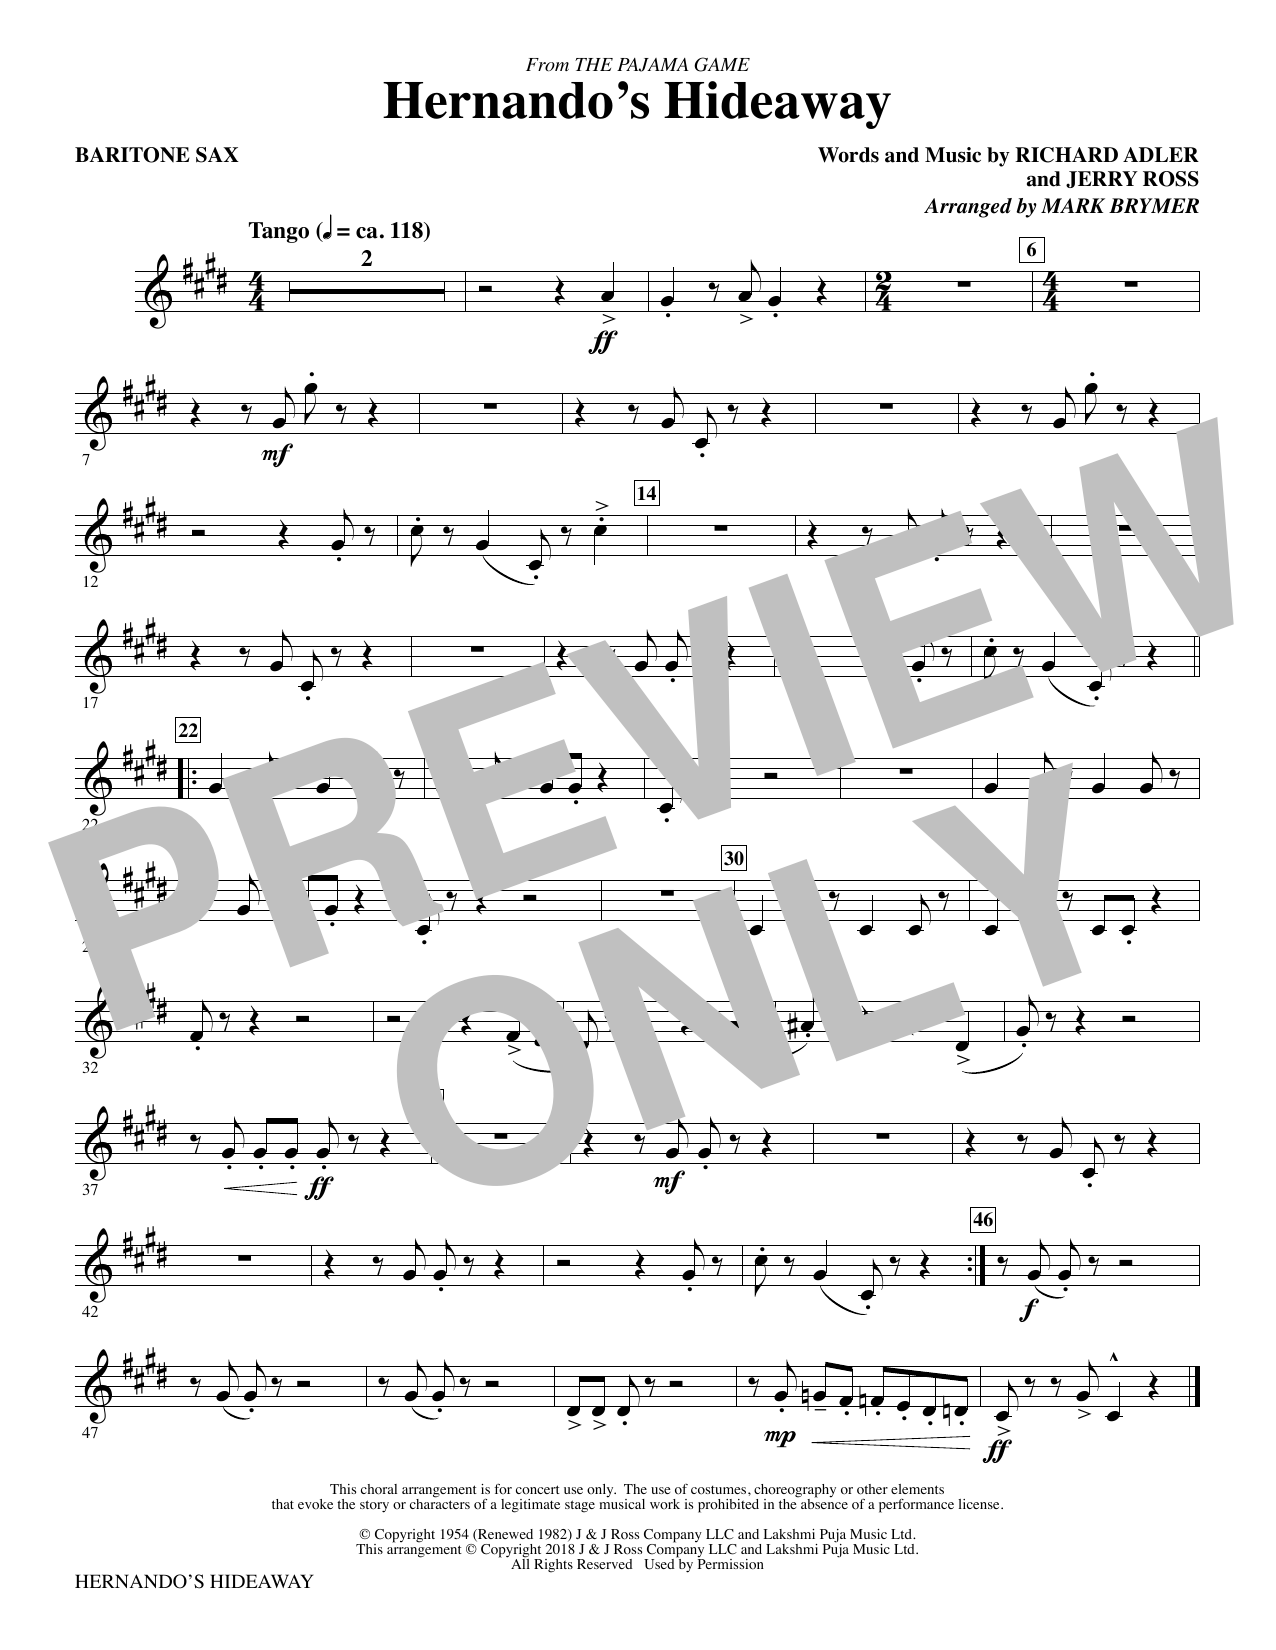 Mark Brymer Hernando's Hideaway - Baritone Sax sheet music notes and chords. Download Printable PDF.